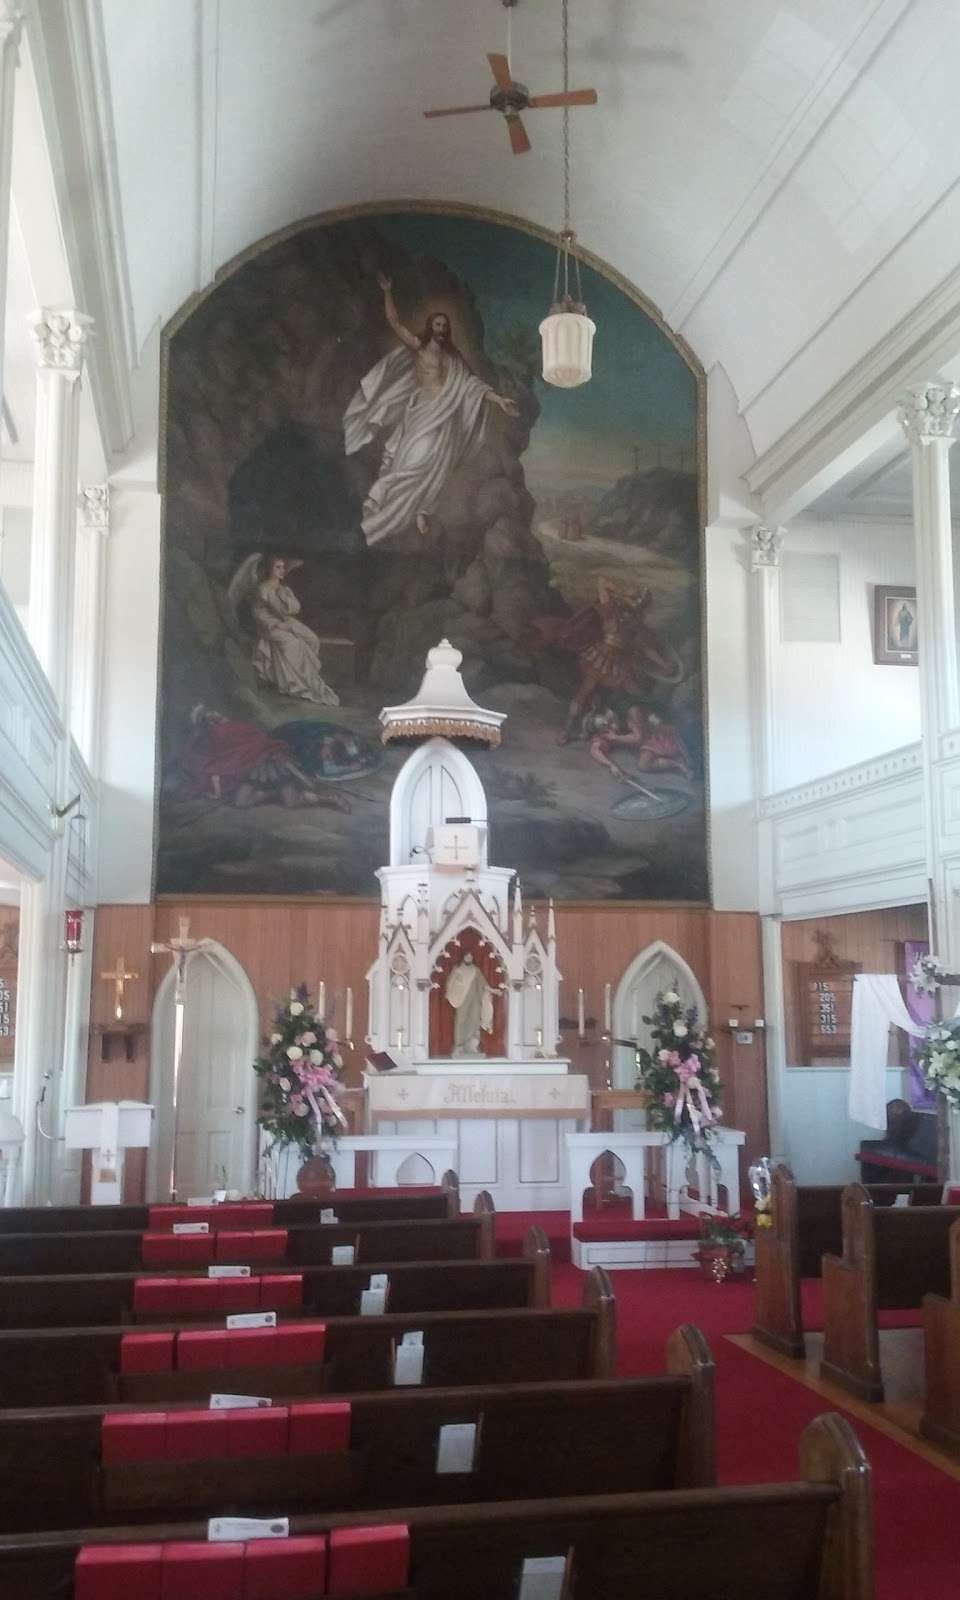 Saint Pauls Lutheran Church - church  | Photo 1 of 2 | Address: Beecher, IL 60401, USA